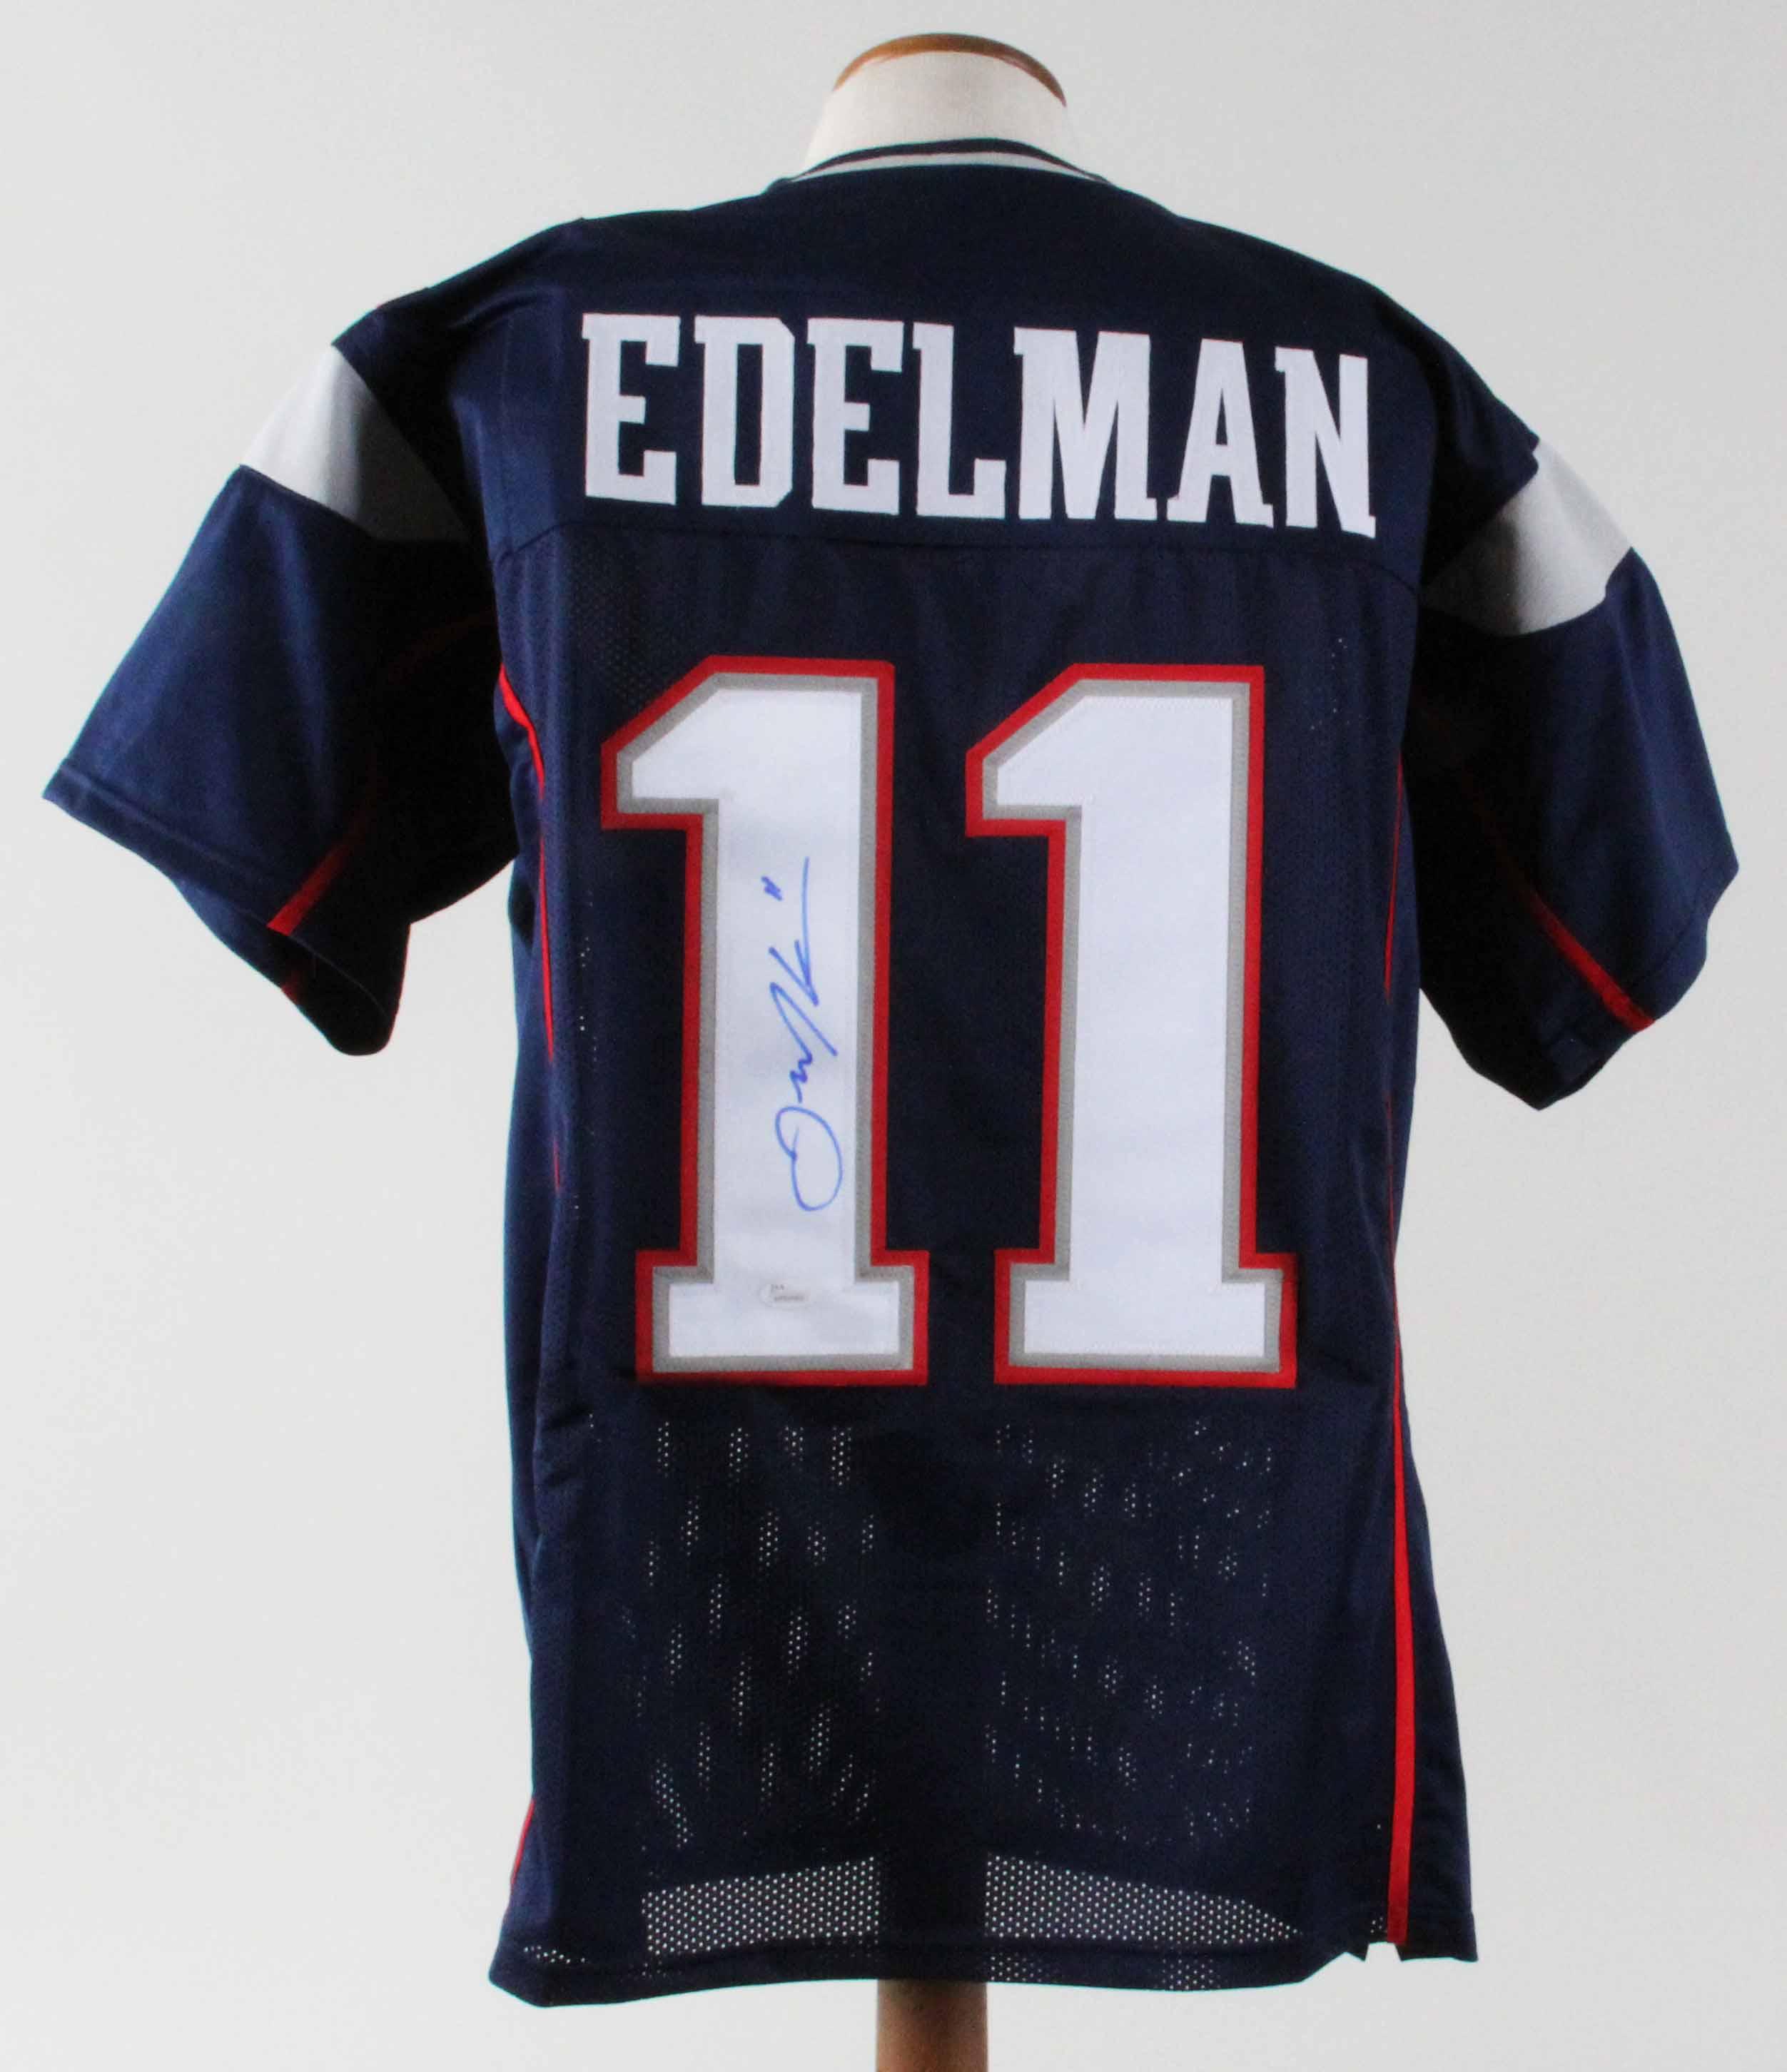 Julian Edelman Signed Jersey Patriots - COA JSA